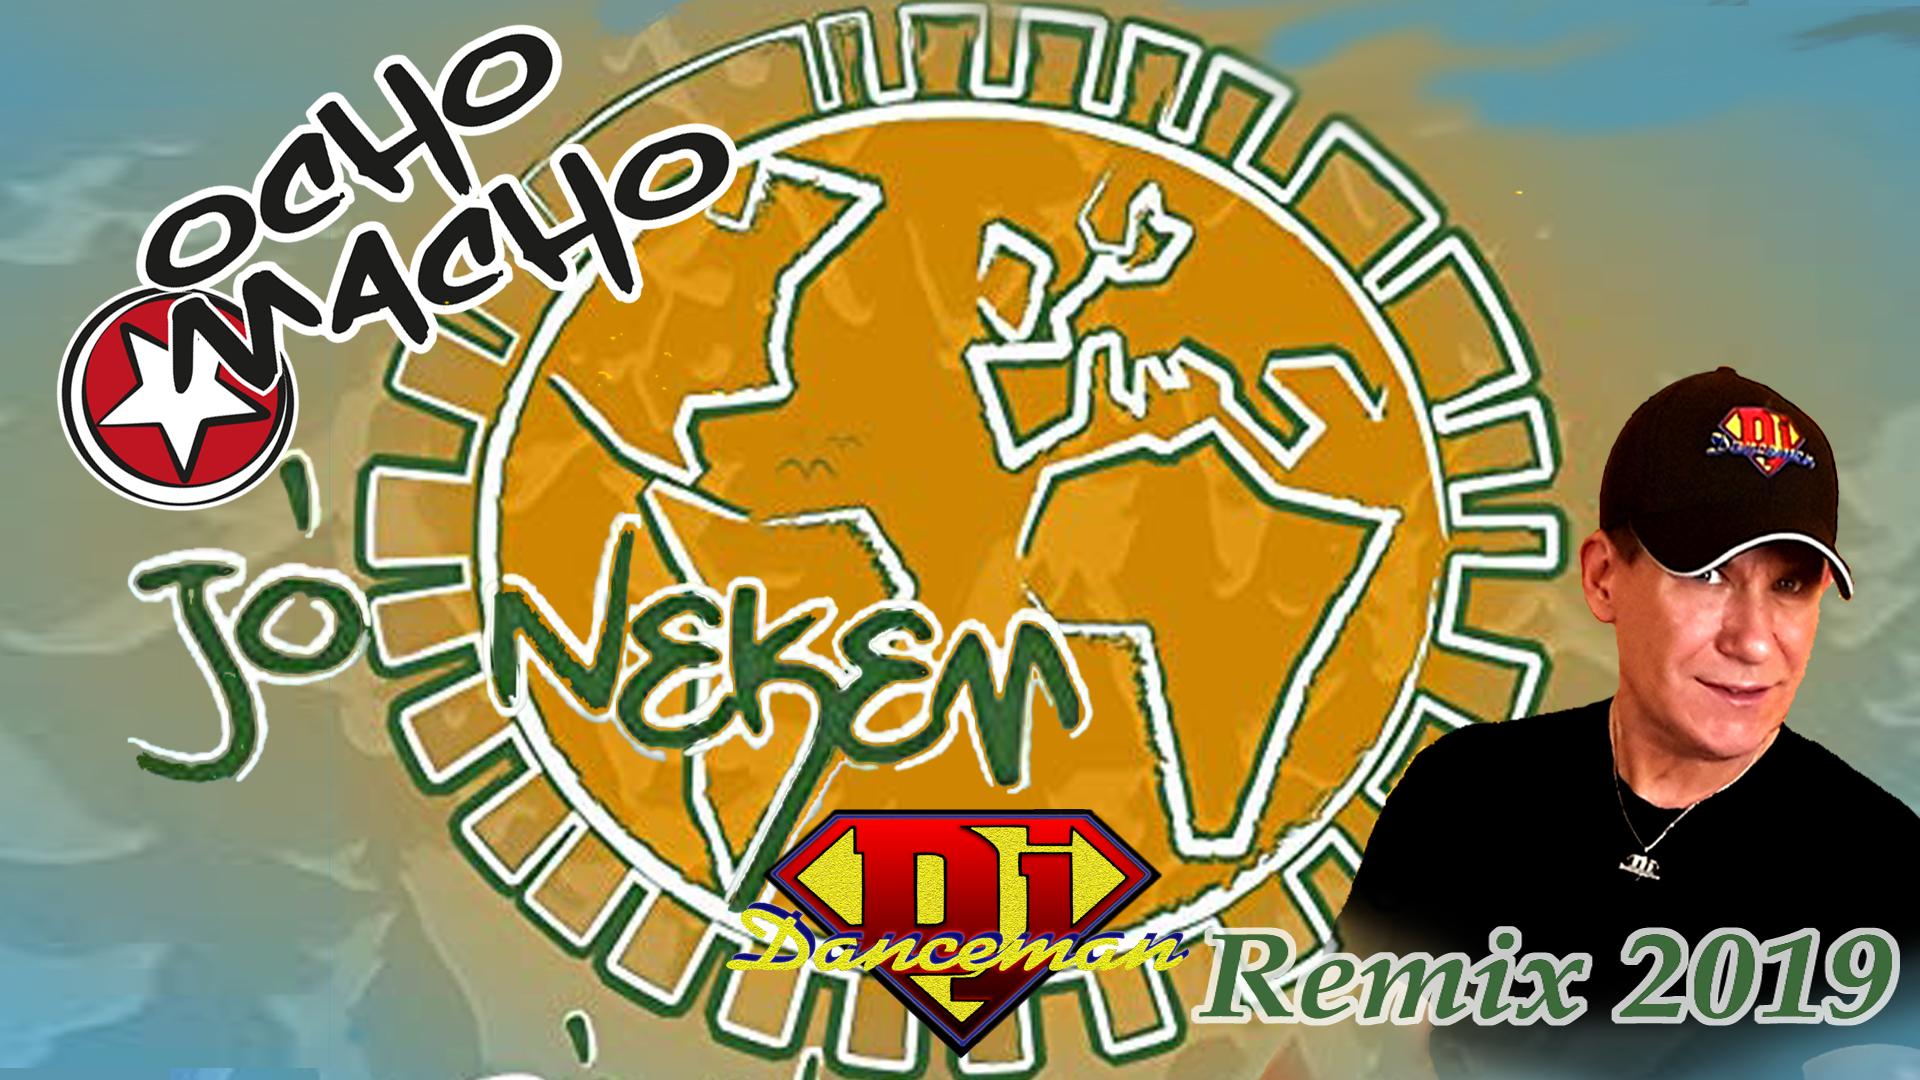 Ocho Macho - Jó nekem Dj Danceman Remix 2019